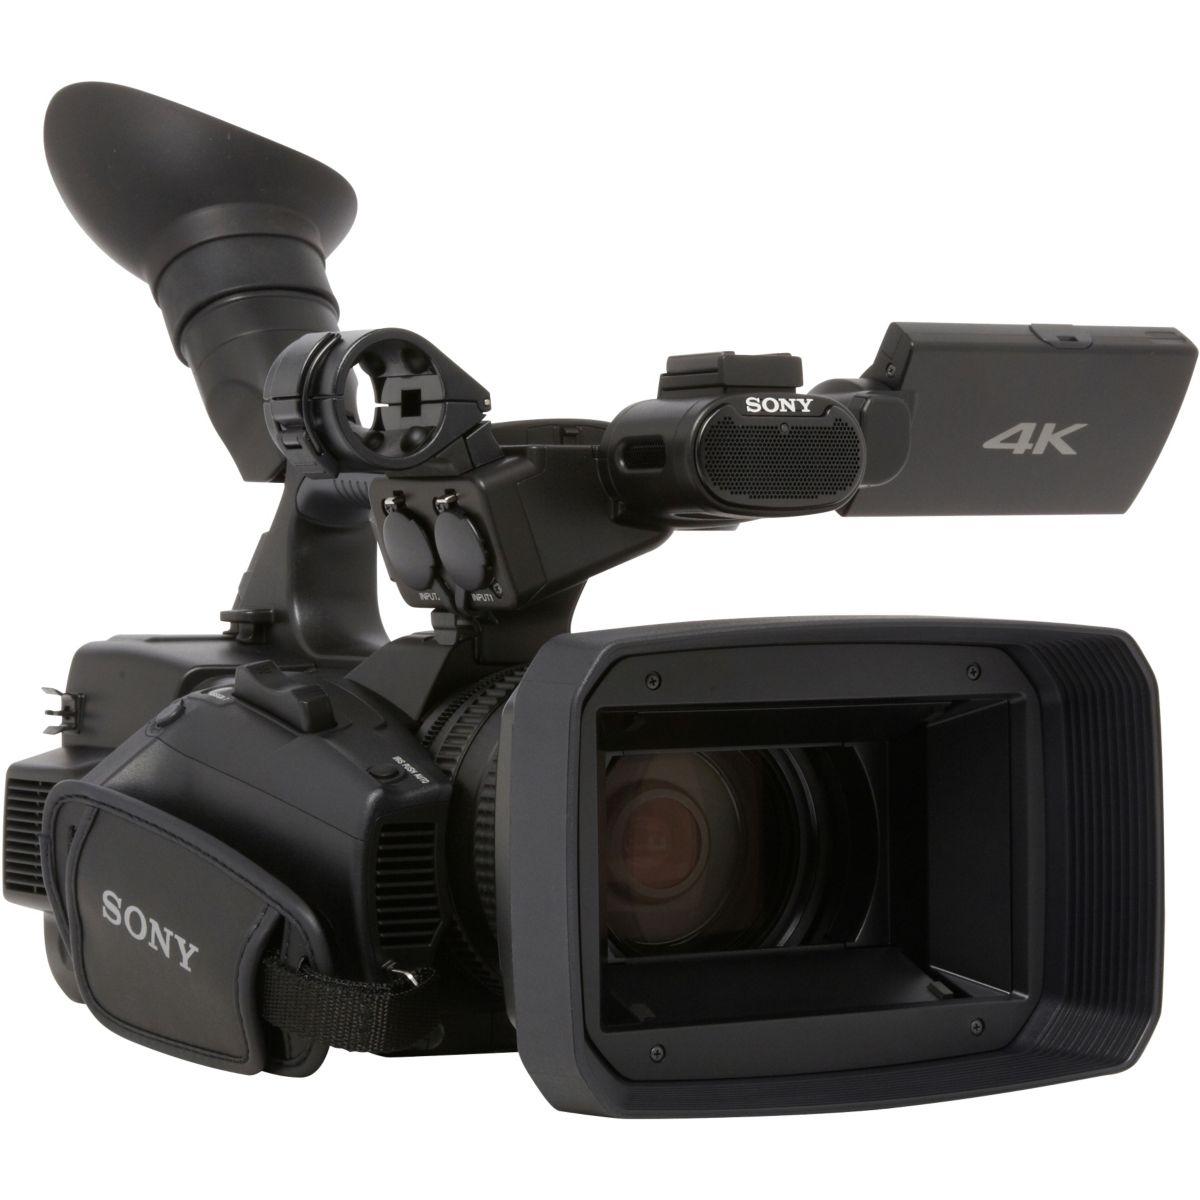 sony fdr ax1 cam scope 4k ultra hd comparer avec. Black Bedroom Furniture Sets. Home Design Ideas